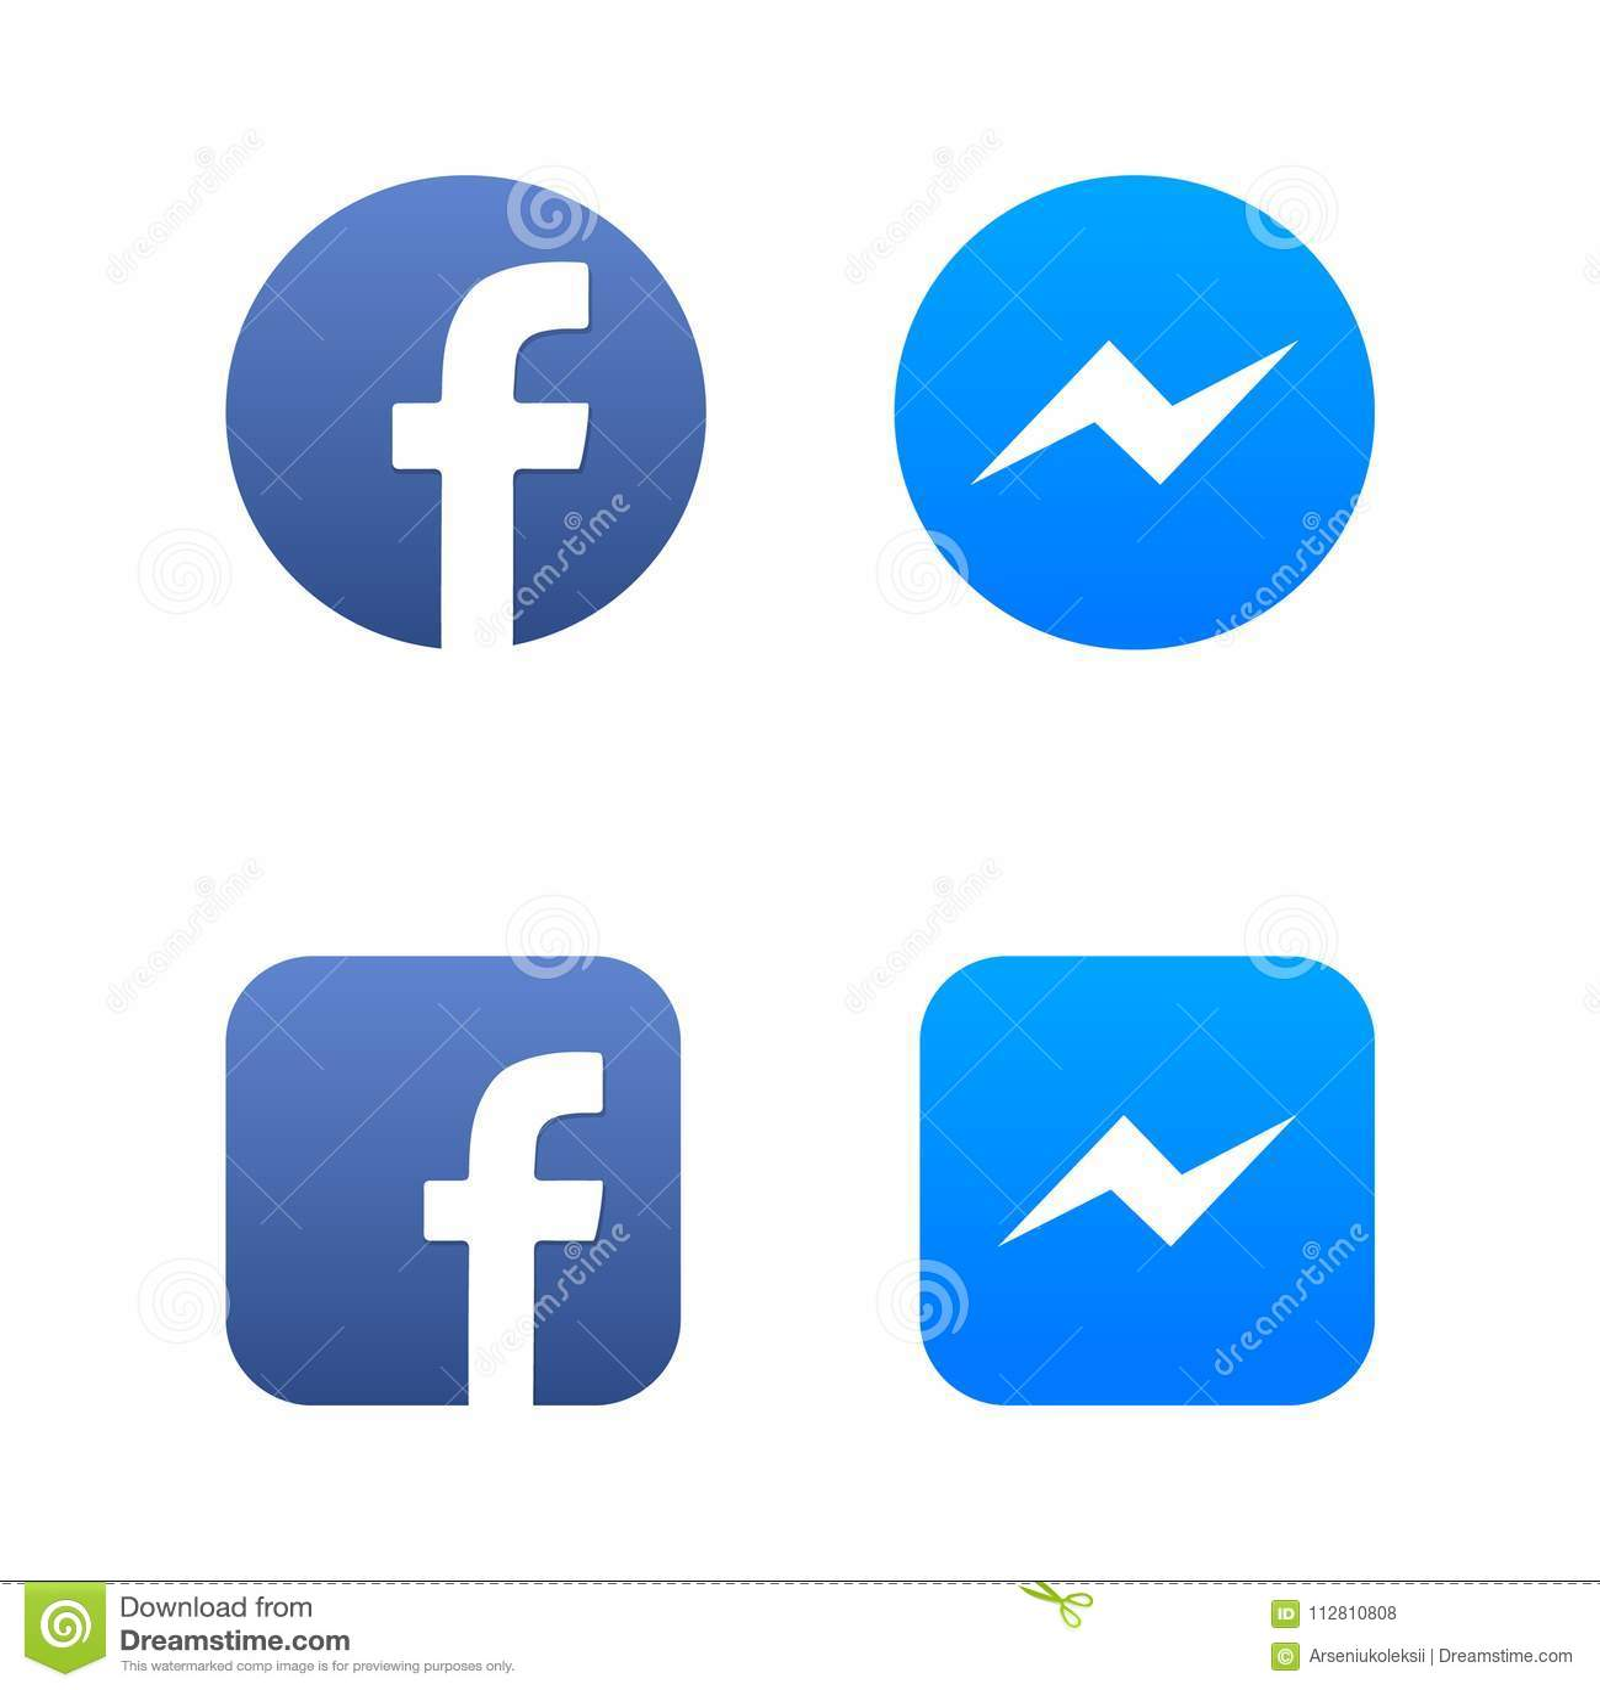 UKRAINE - CHERKASY JANUARY 22, 2018 Facebook and messenger media icons